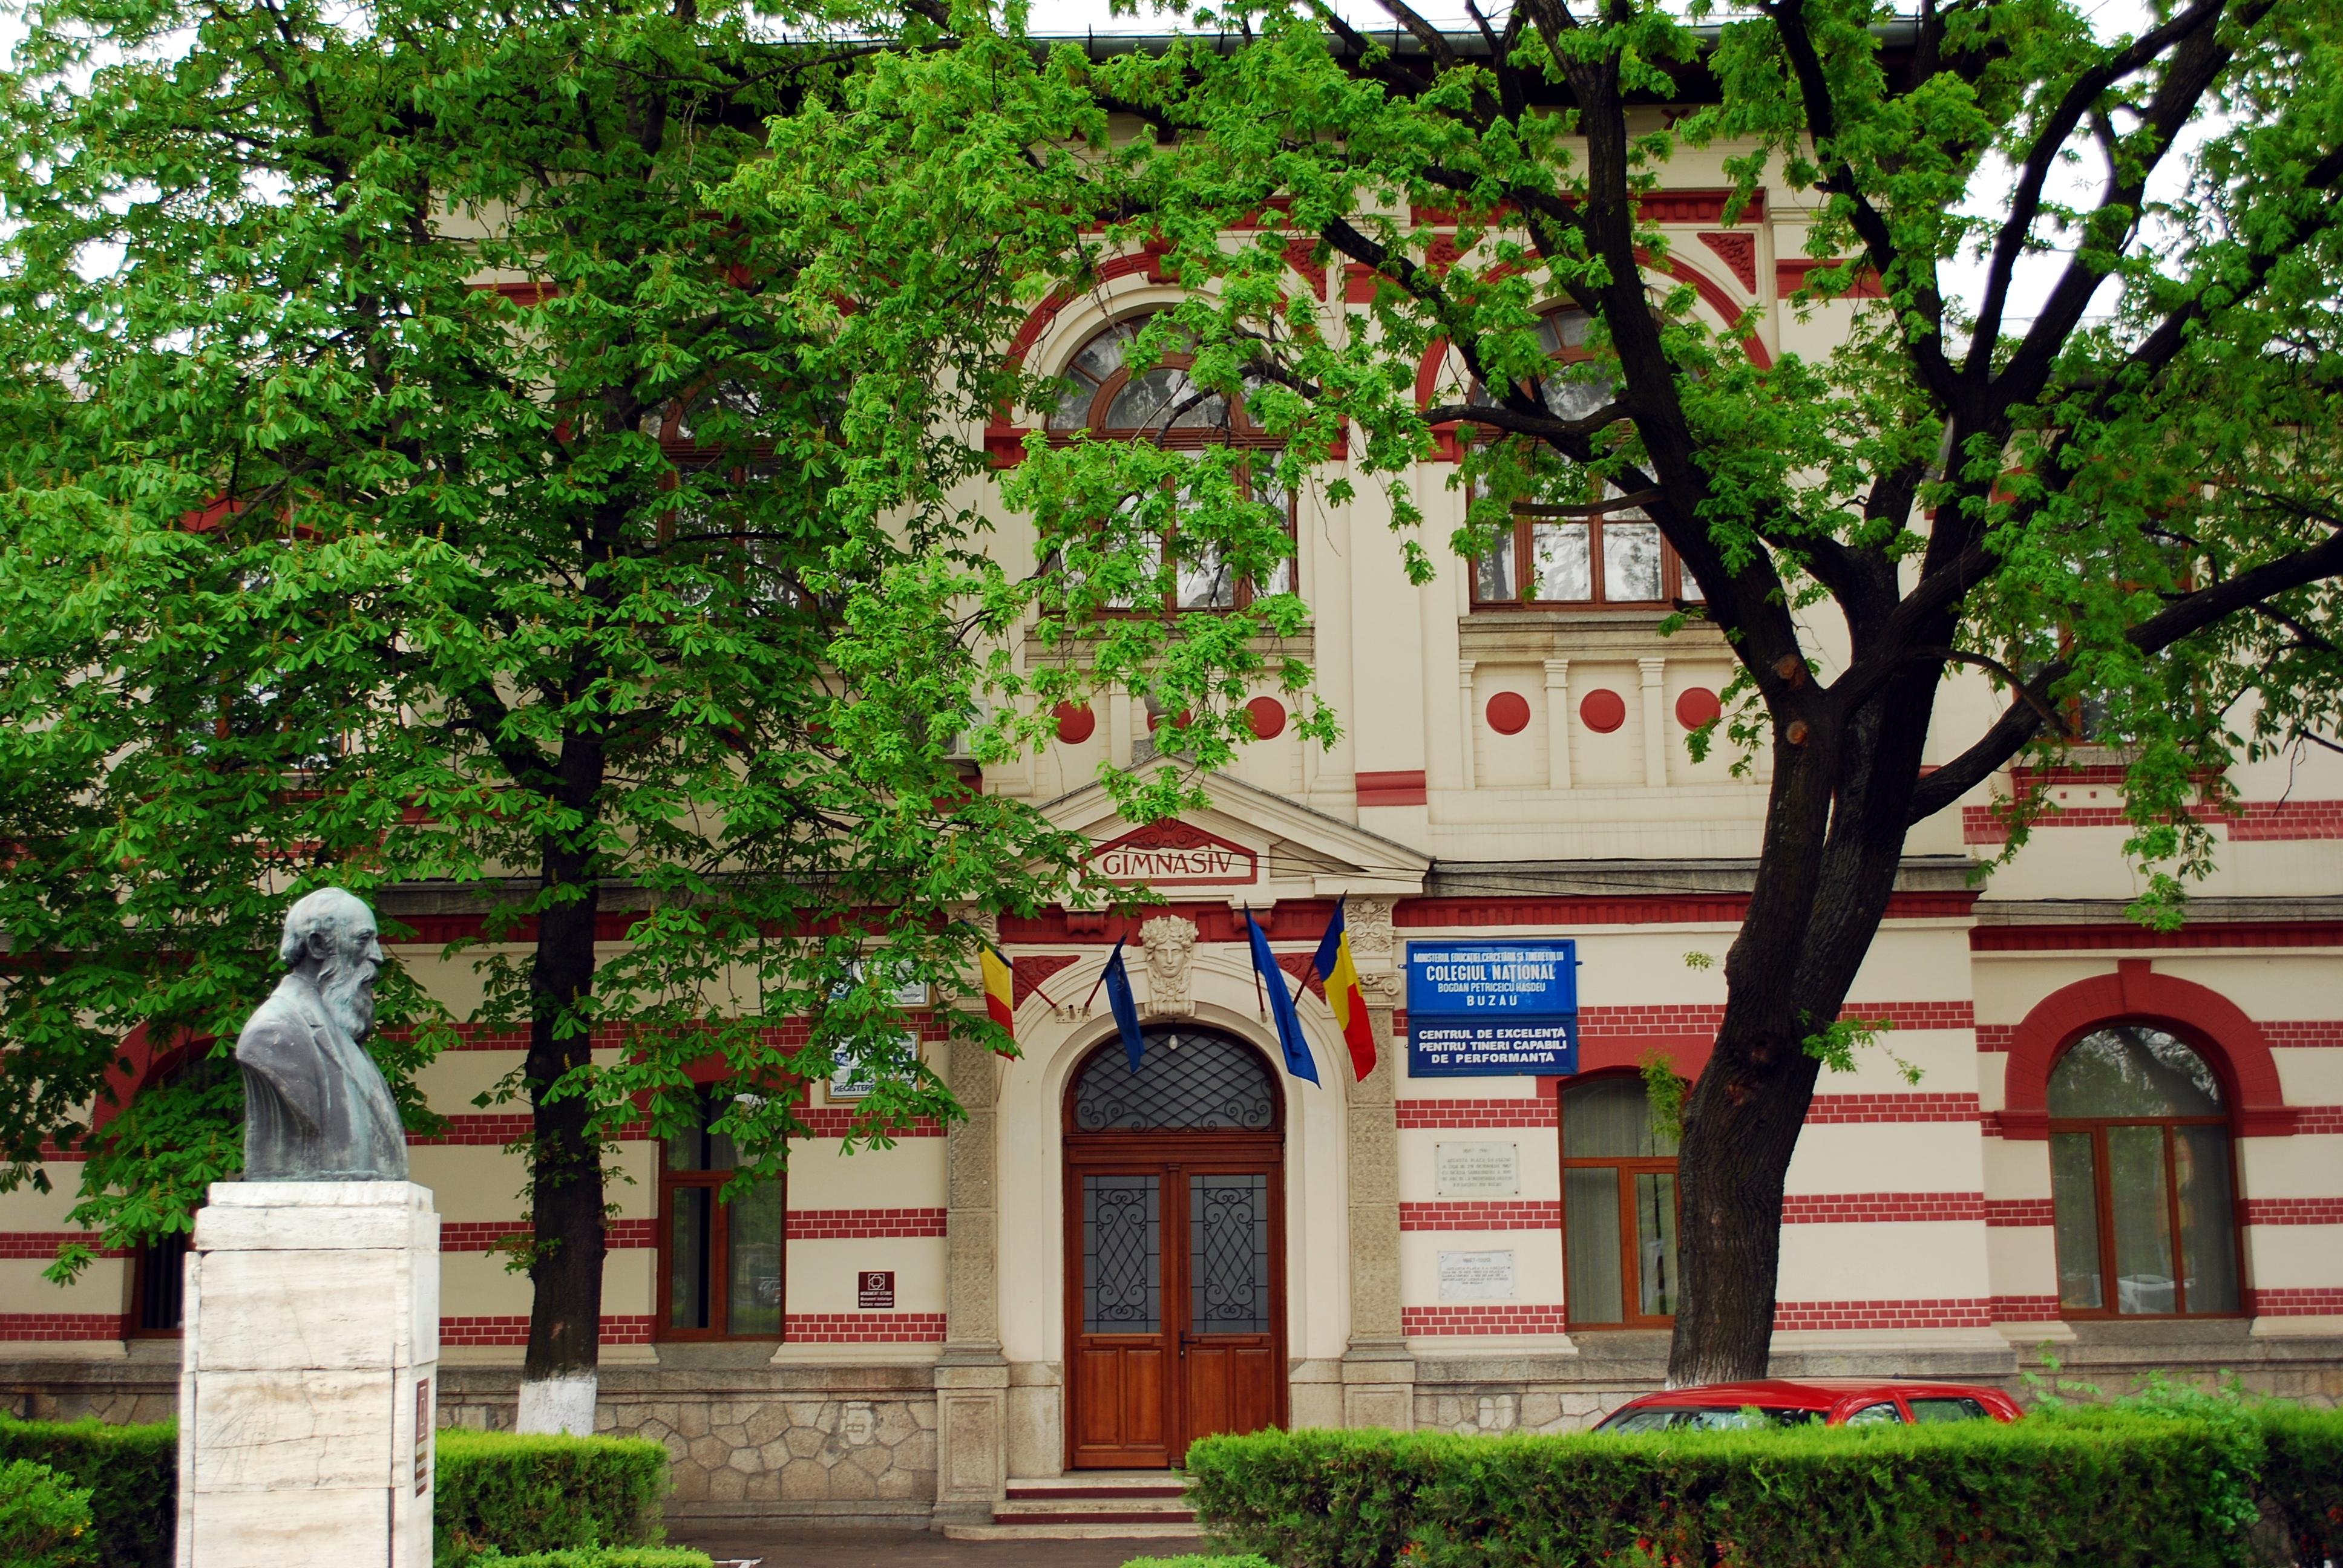 Fişier:RO BZ Hasdeu entrance.jpg